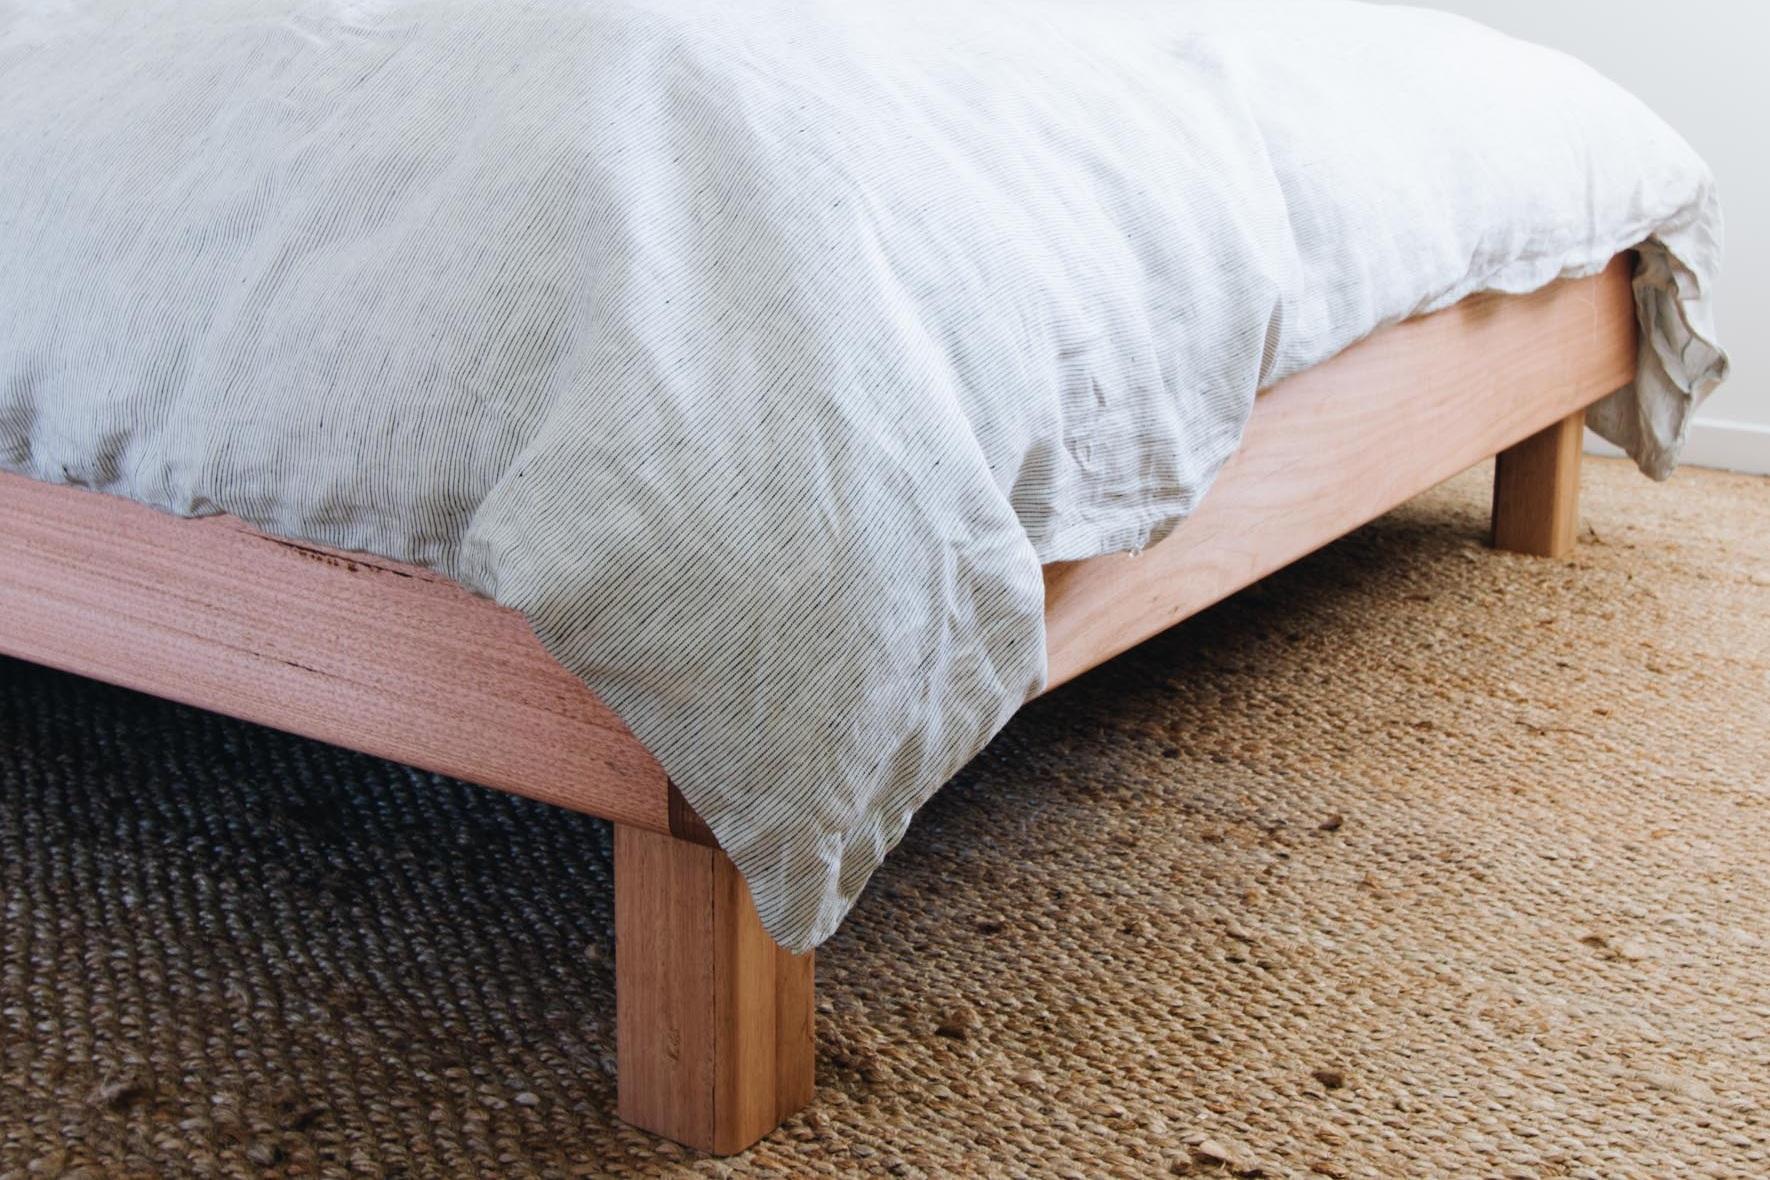 Al+and+Imo+Handmade+-+Custom+Minimalist+bedframe+-+Low+Bed+with+angled+headboard+-+victorian+ash+-+Melbourne+-+Australia_-7.jpg